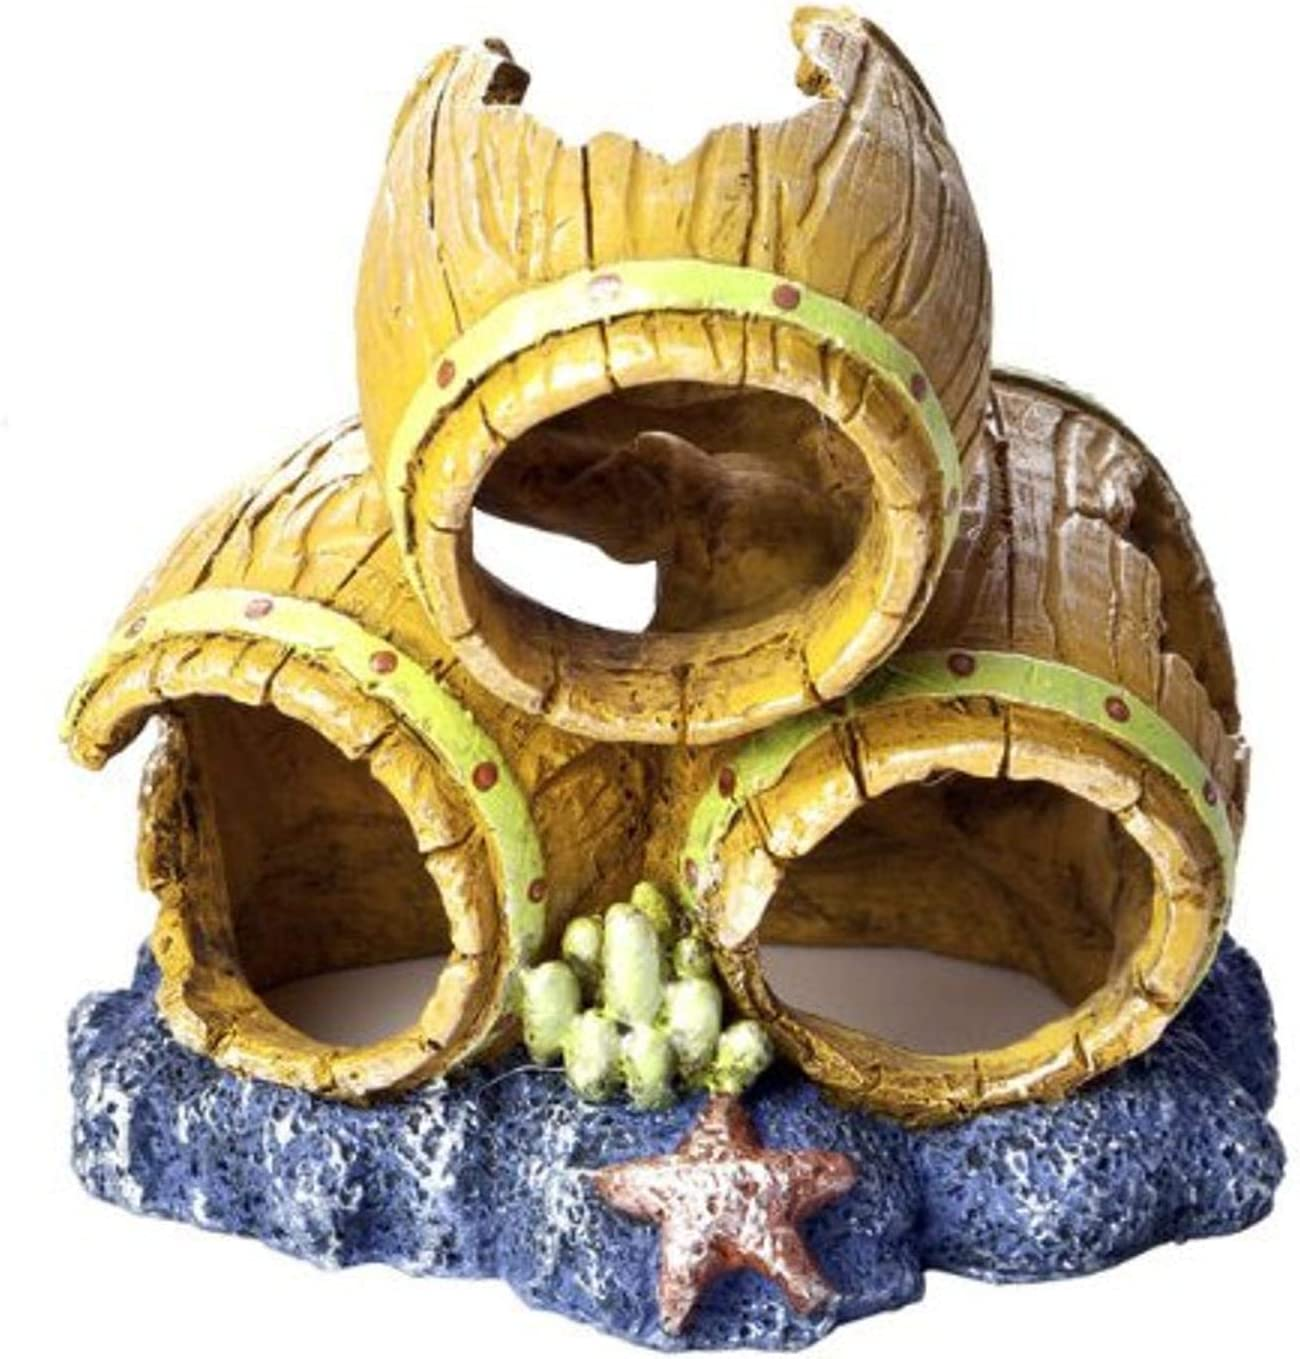 GloFish Barrels Ornament, Small, Detailed aquarium Ornament, Hideaway For Fish